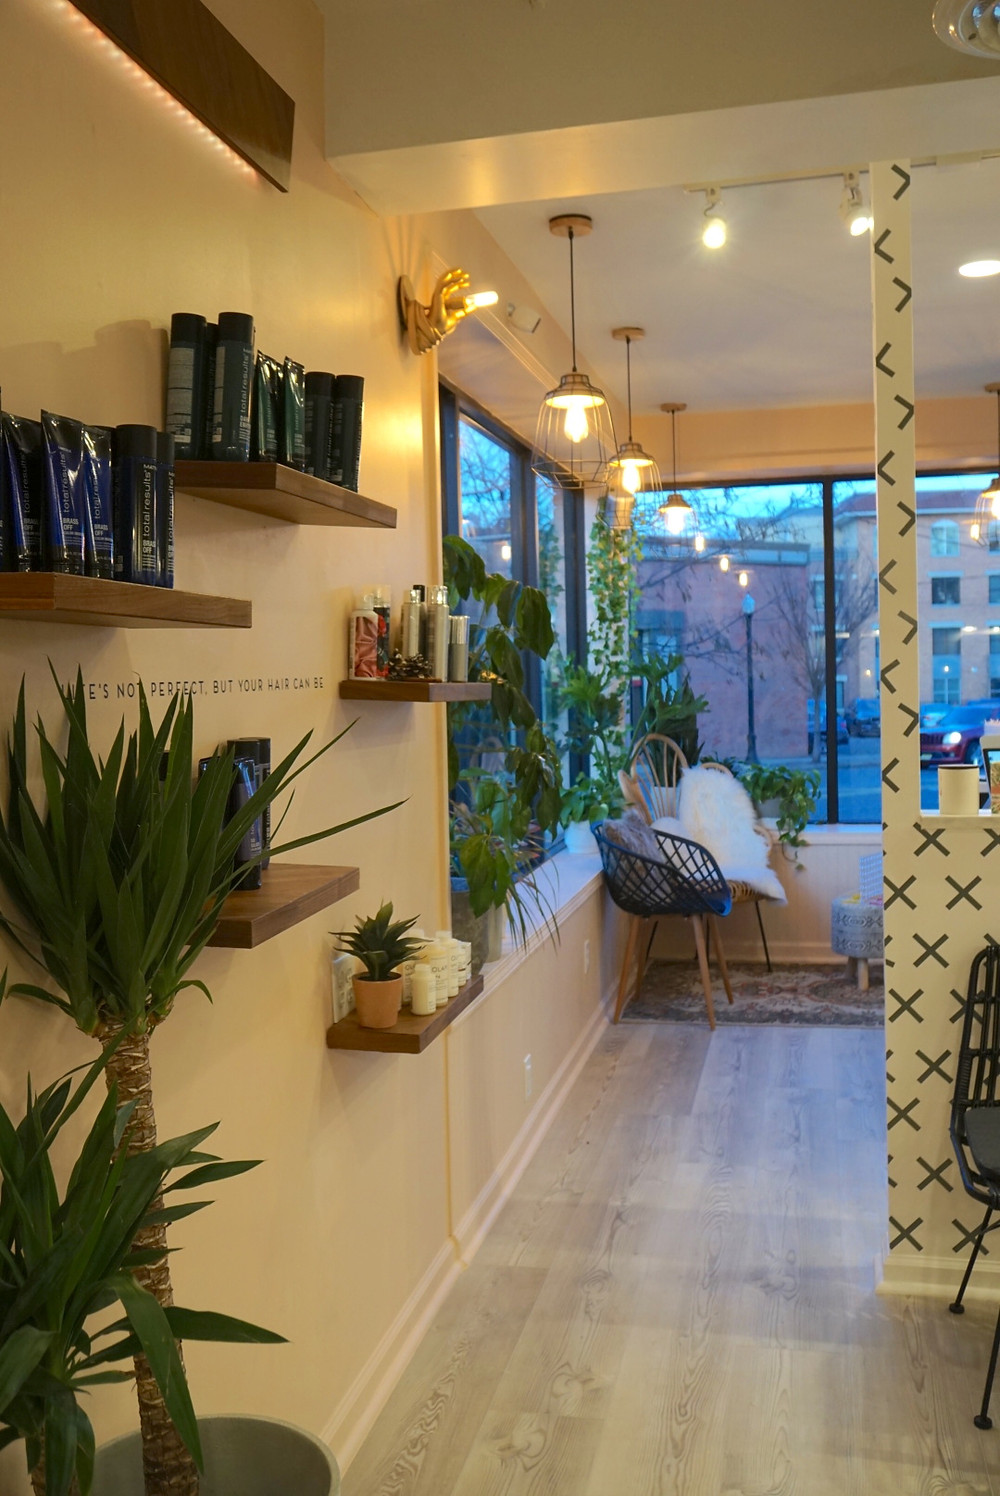 Scandinavian, botanical, boho interior design. Hair Salon Decor and Design at The Salon Westfield. Westfield NJ